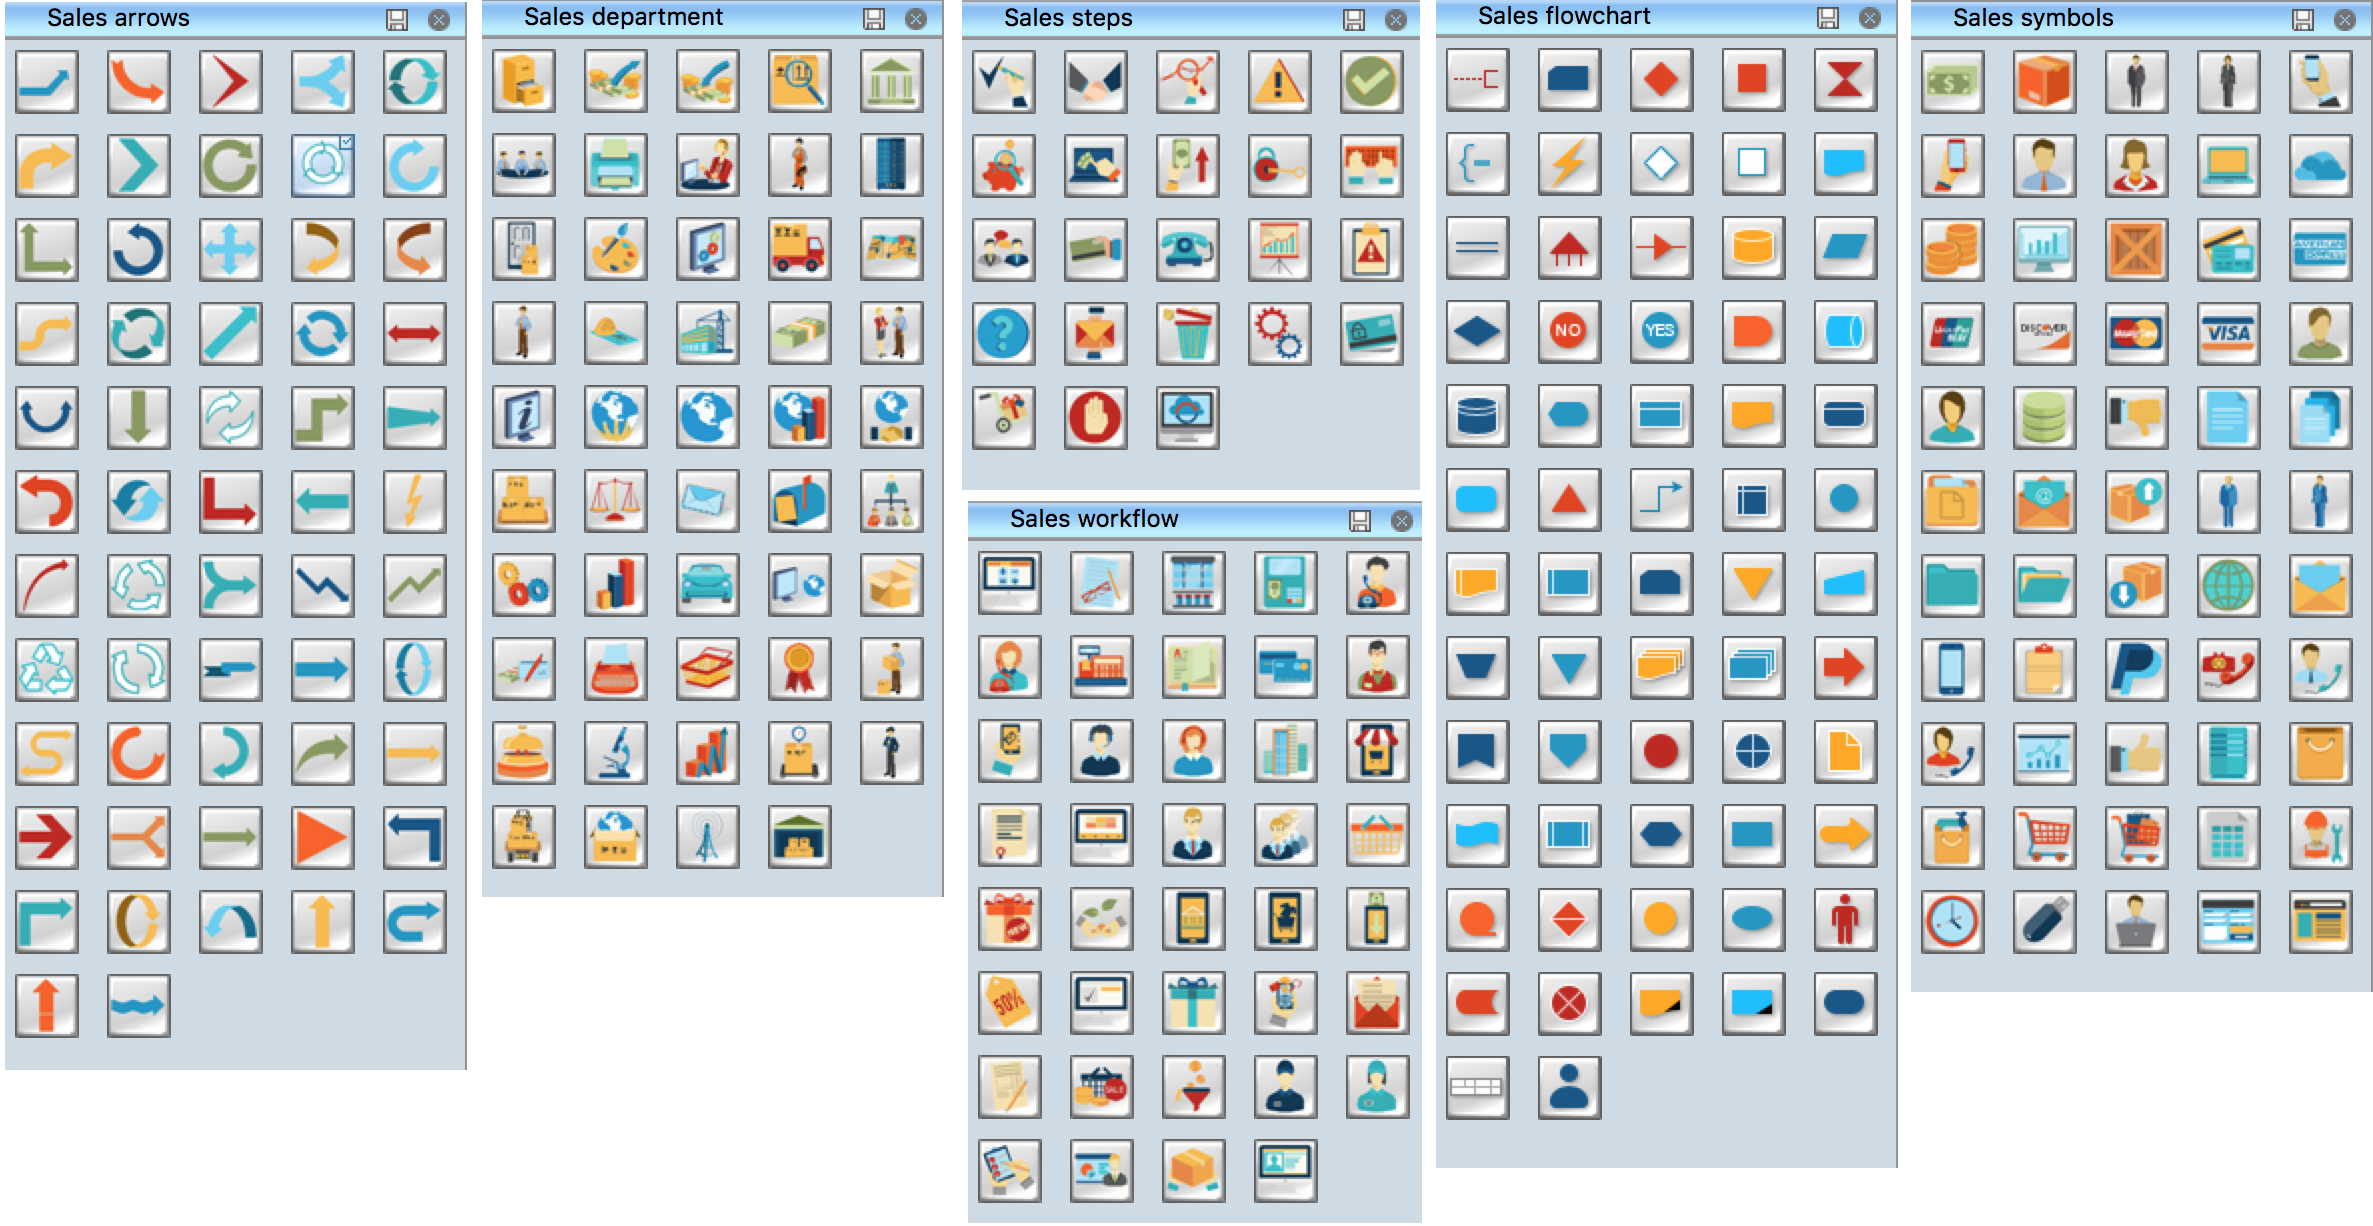 sales process flowchart symbols sales process flow diagram red green blue colored flowchart symbols [ 2373 x 1226 Pixel ]